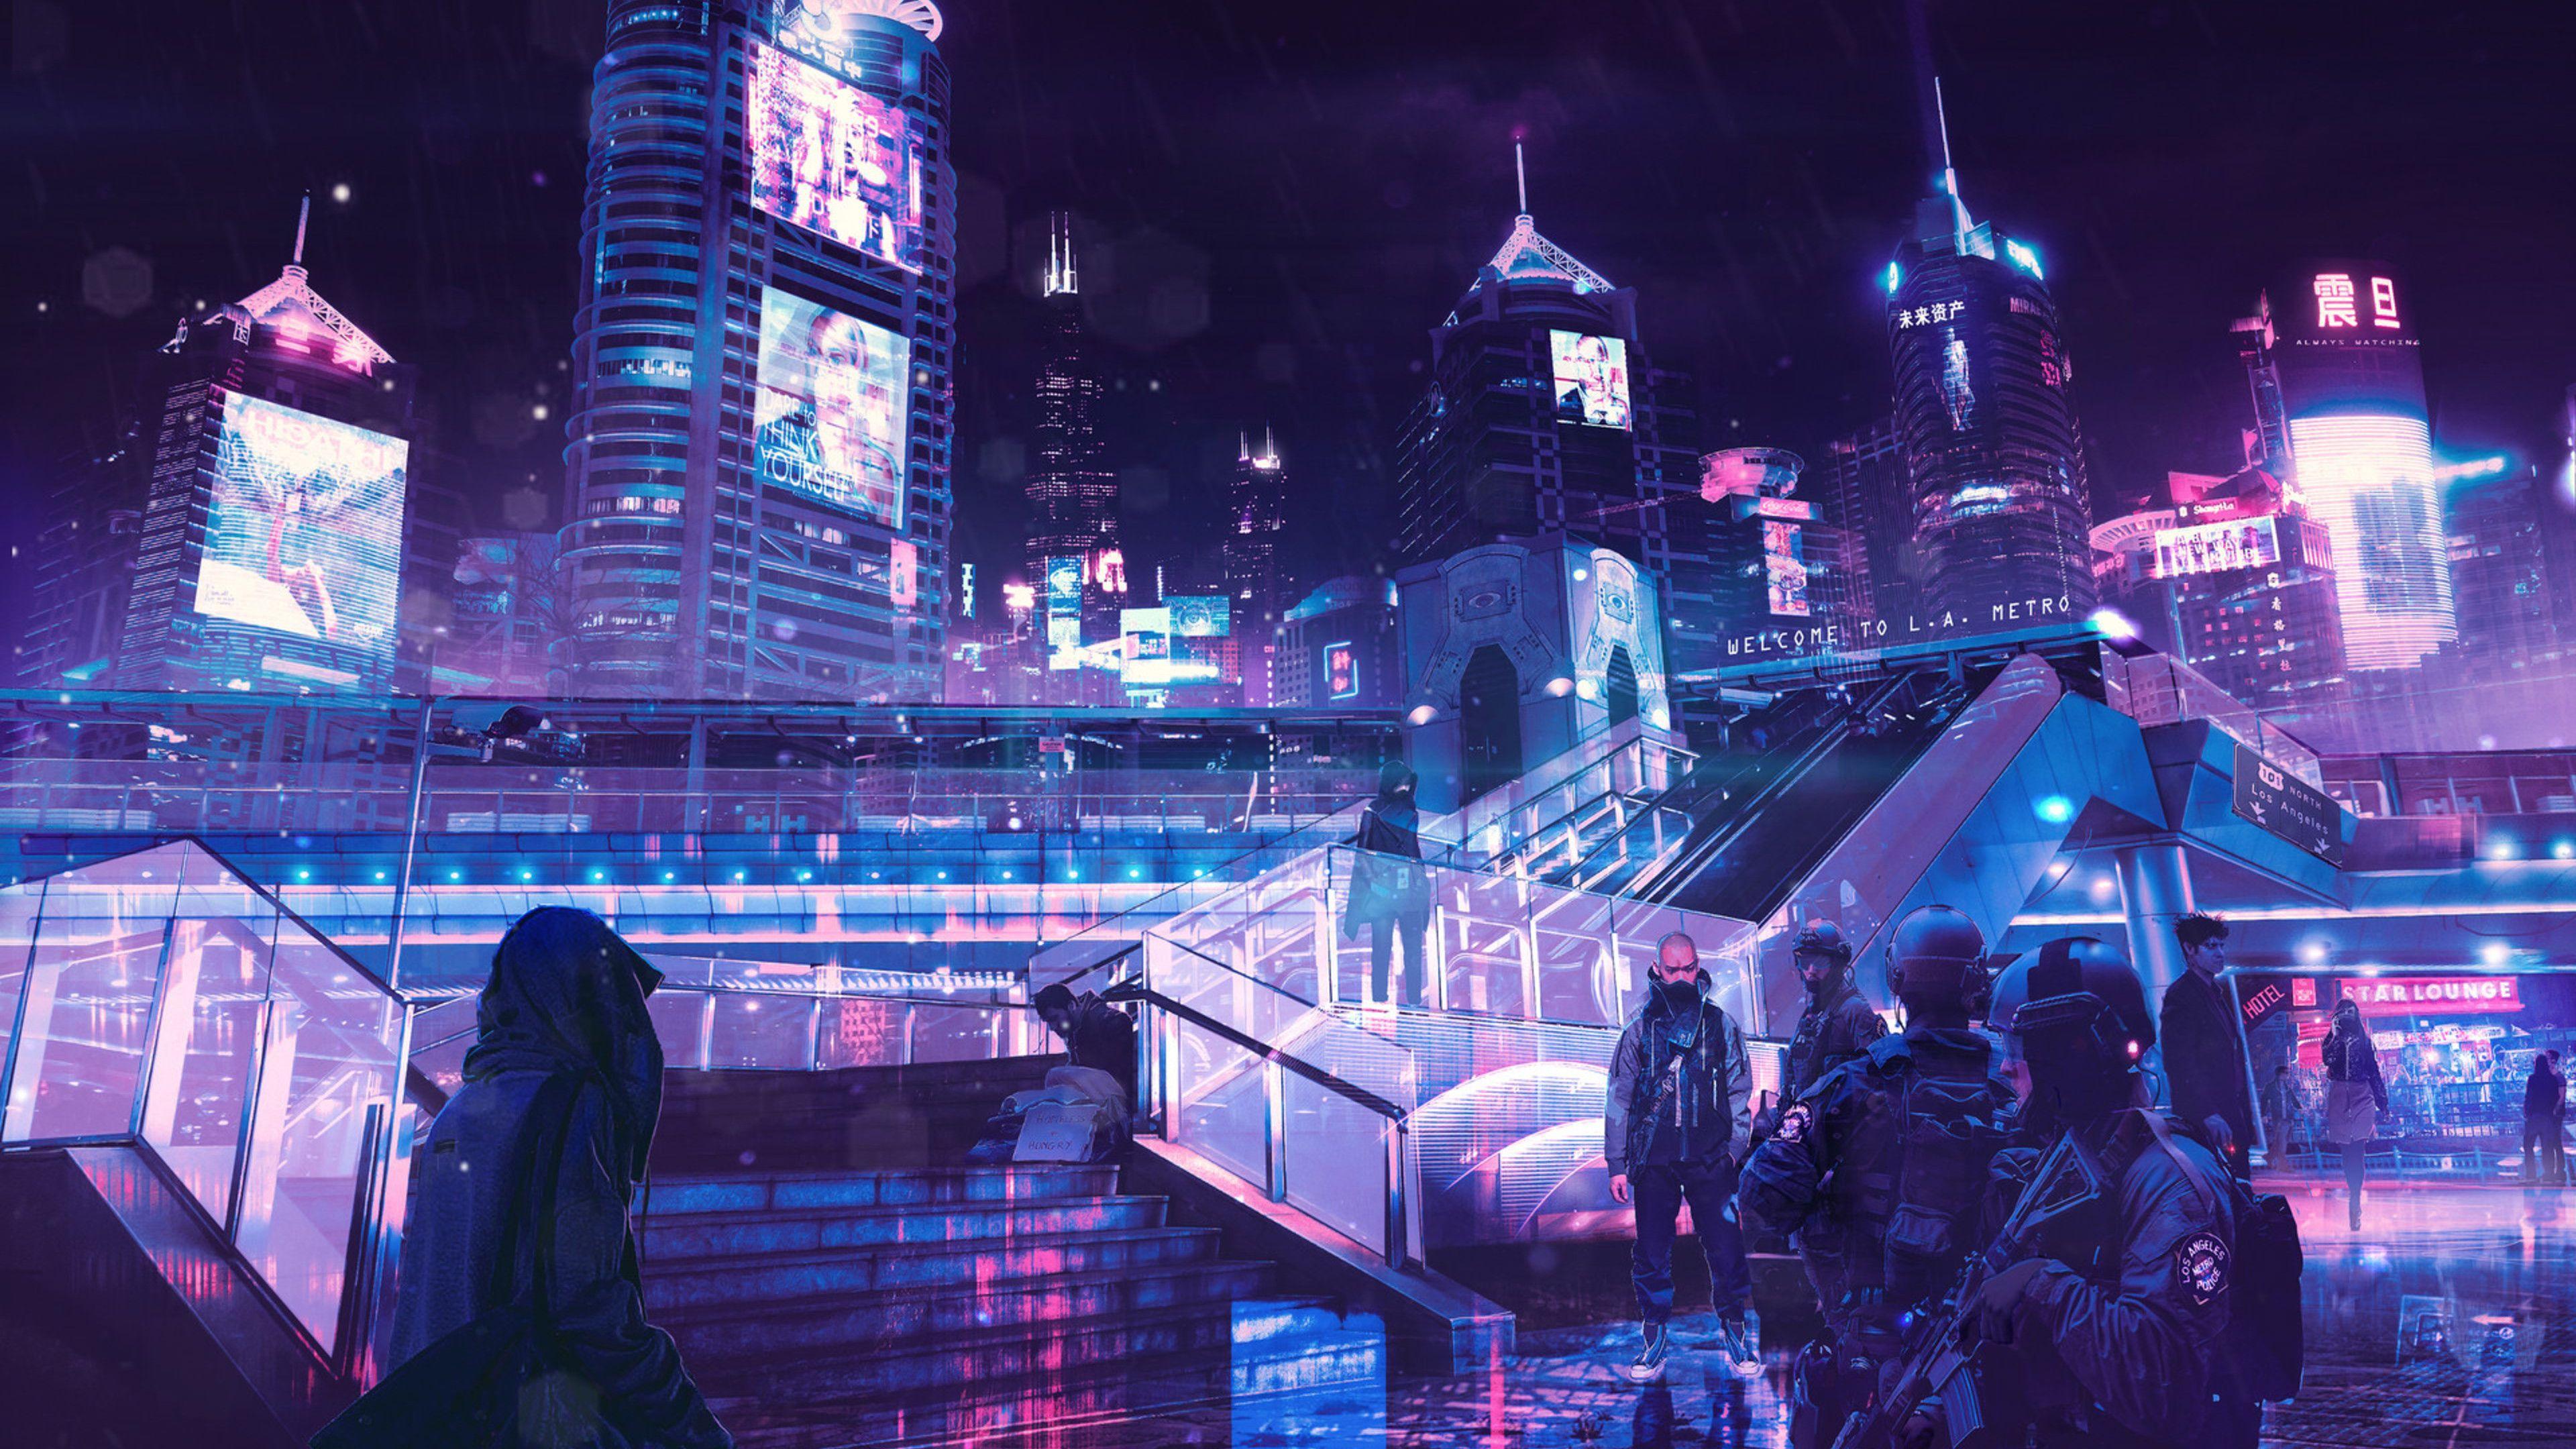 3840x2160 Cyberpunk Neon City Hình nền 4k HD 4k, Hình ảnh